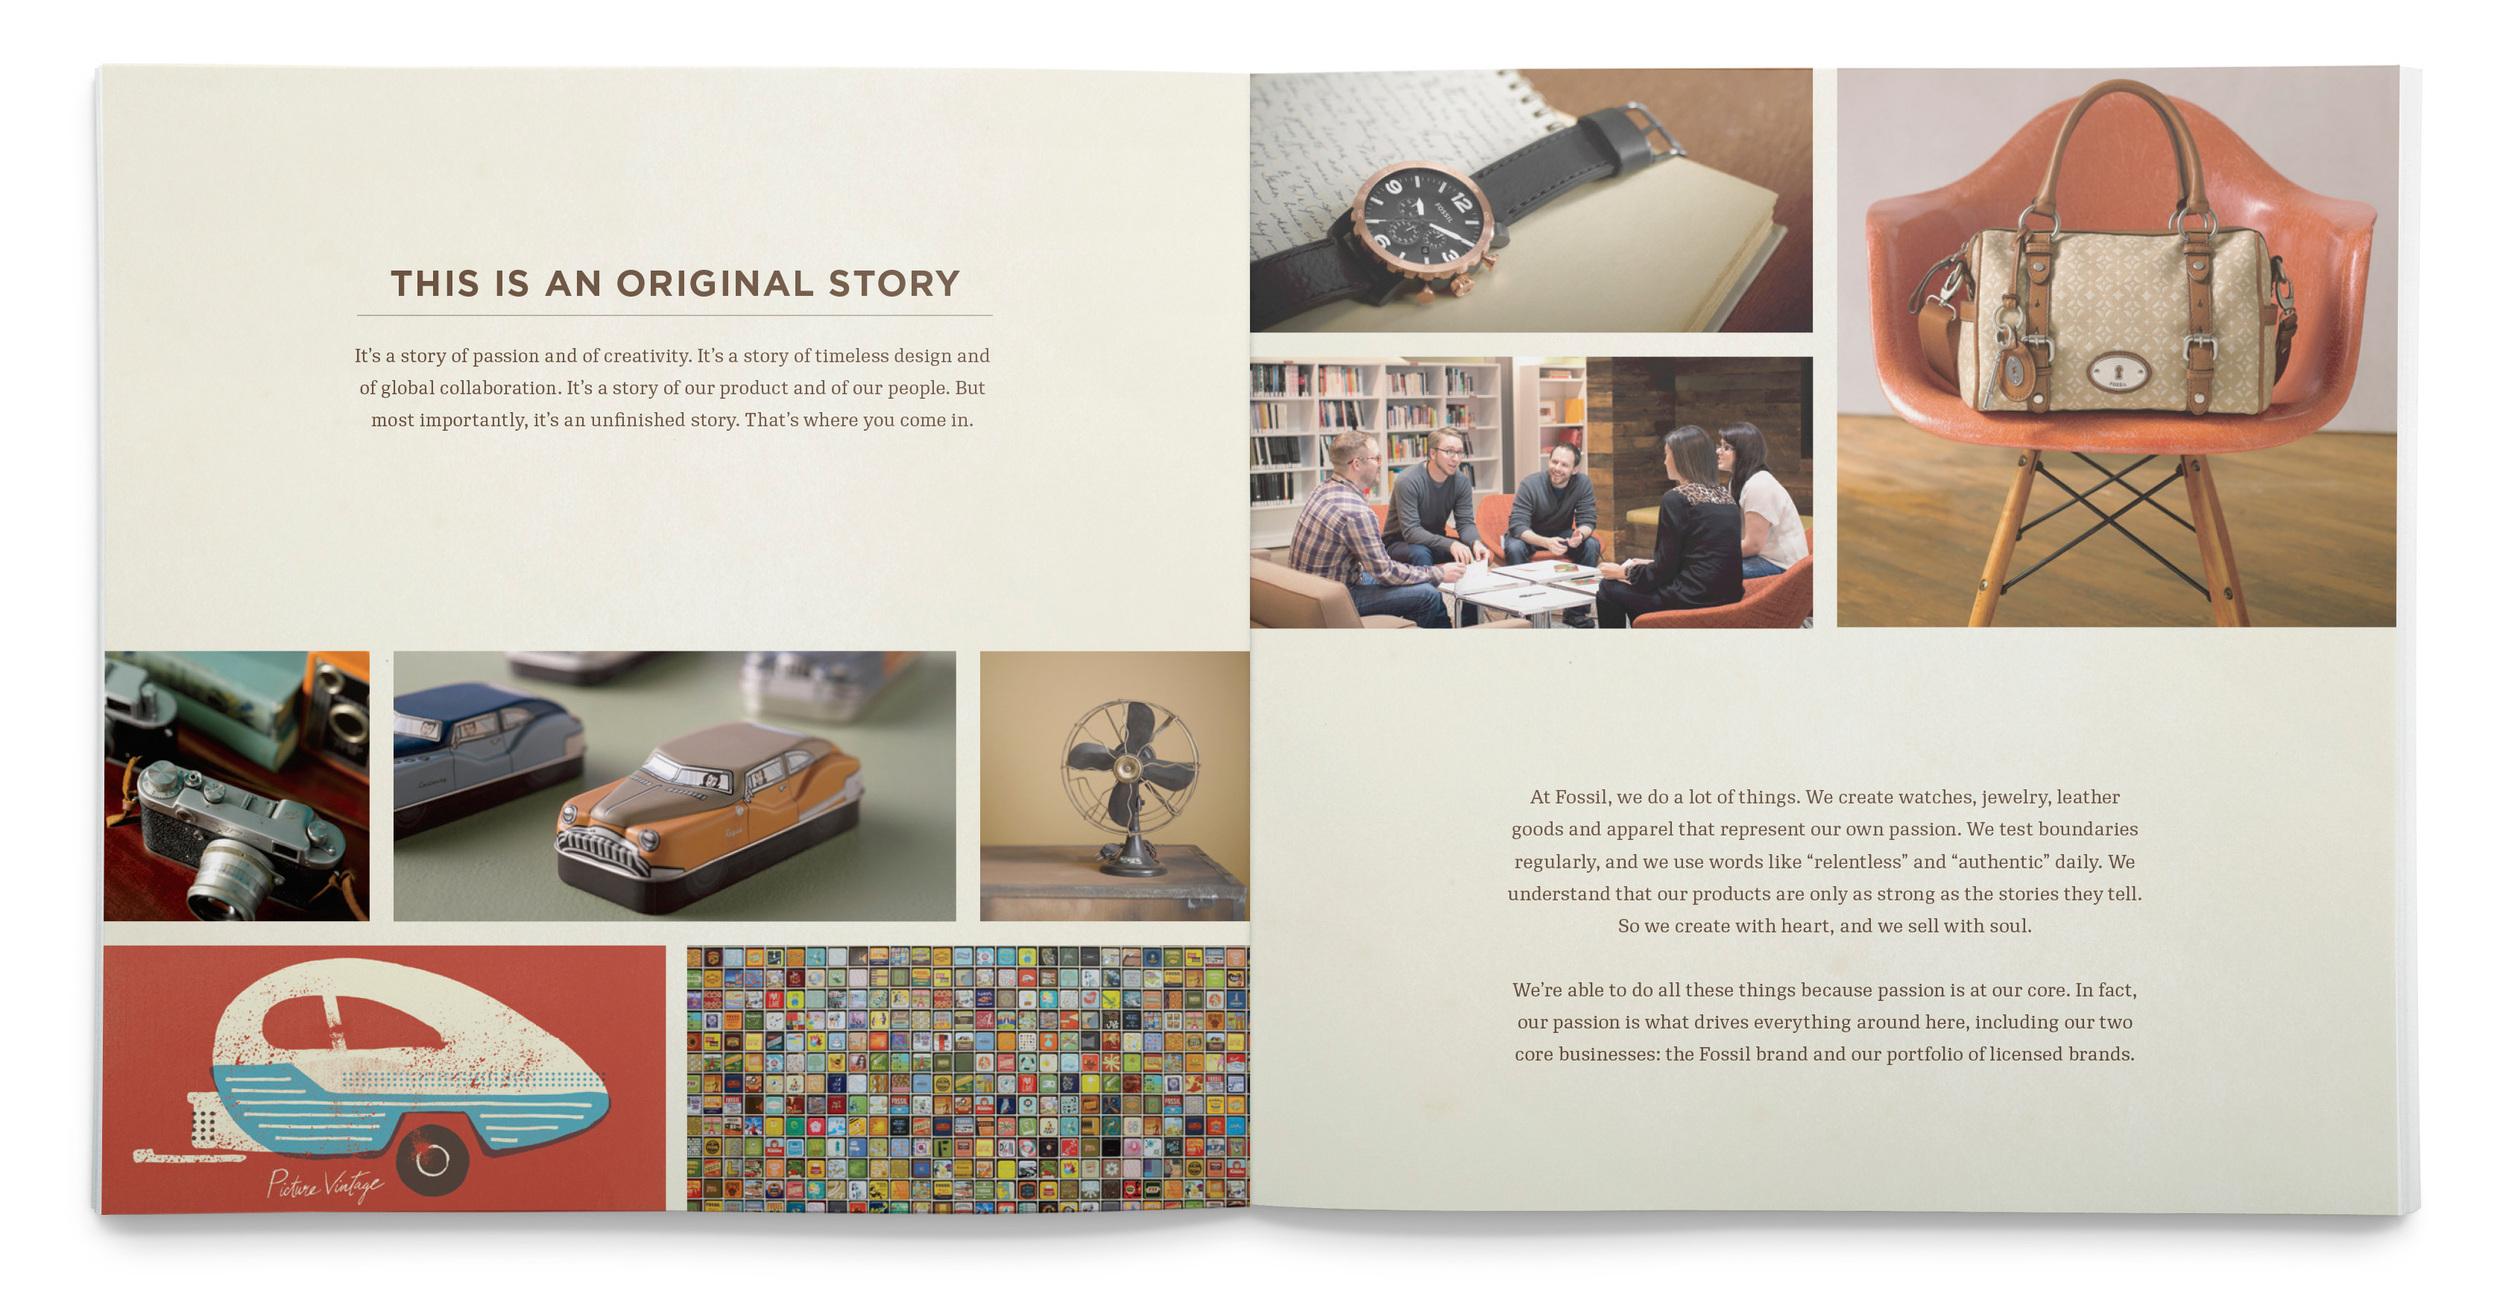 Fossil_brochure_story.jpg